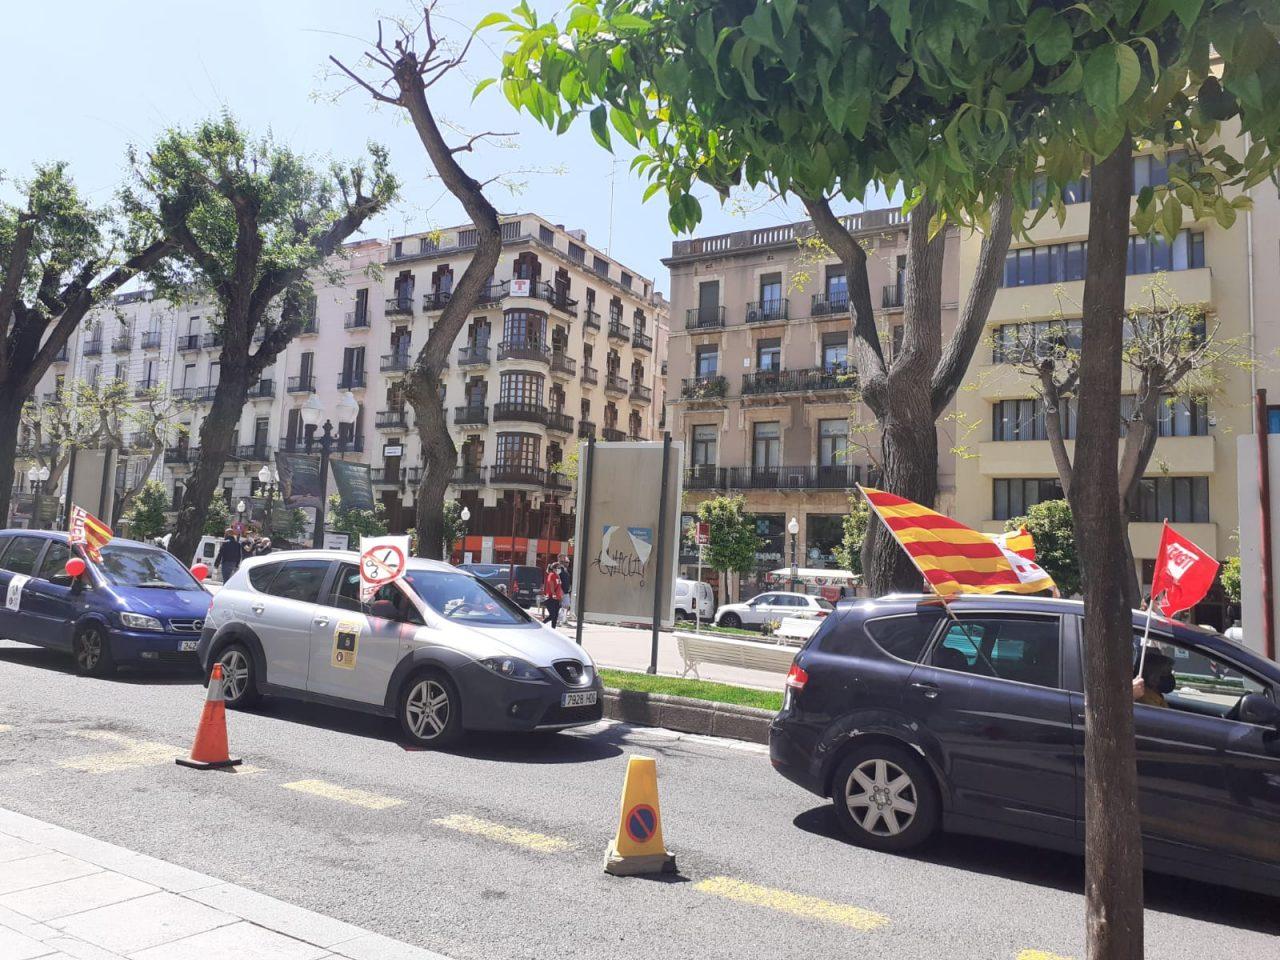 Marxa-rodada-Tarragona-Correus-1280x960.jpg